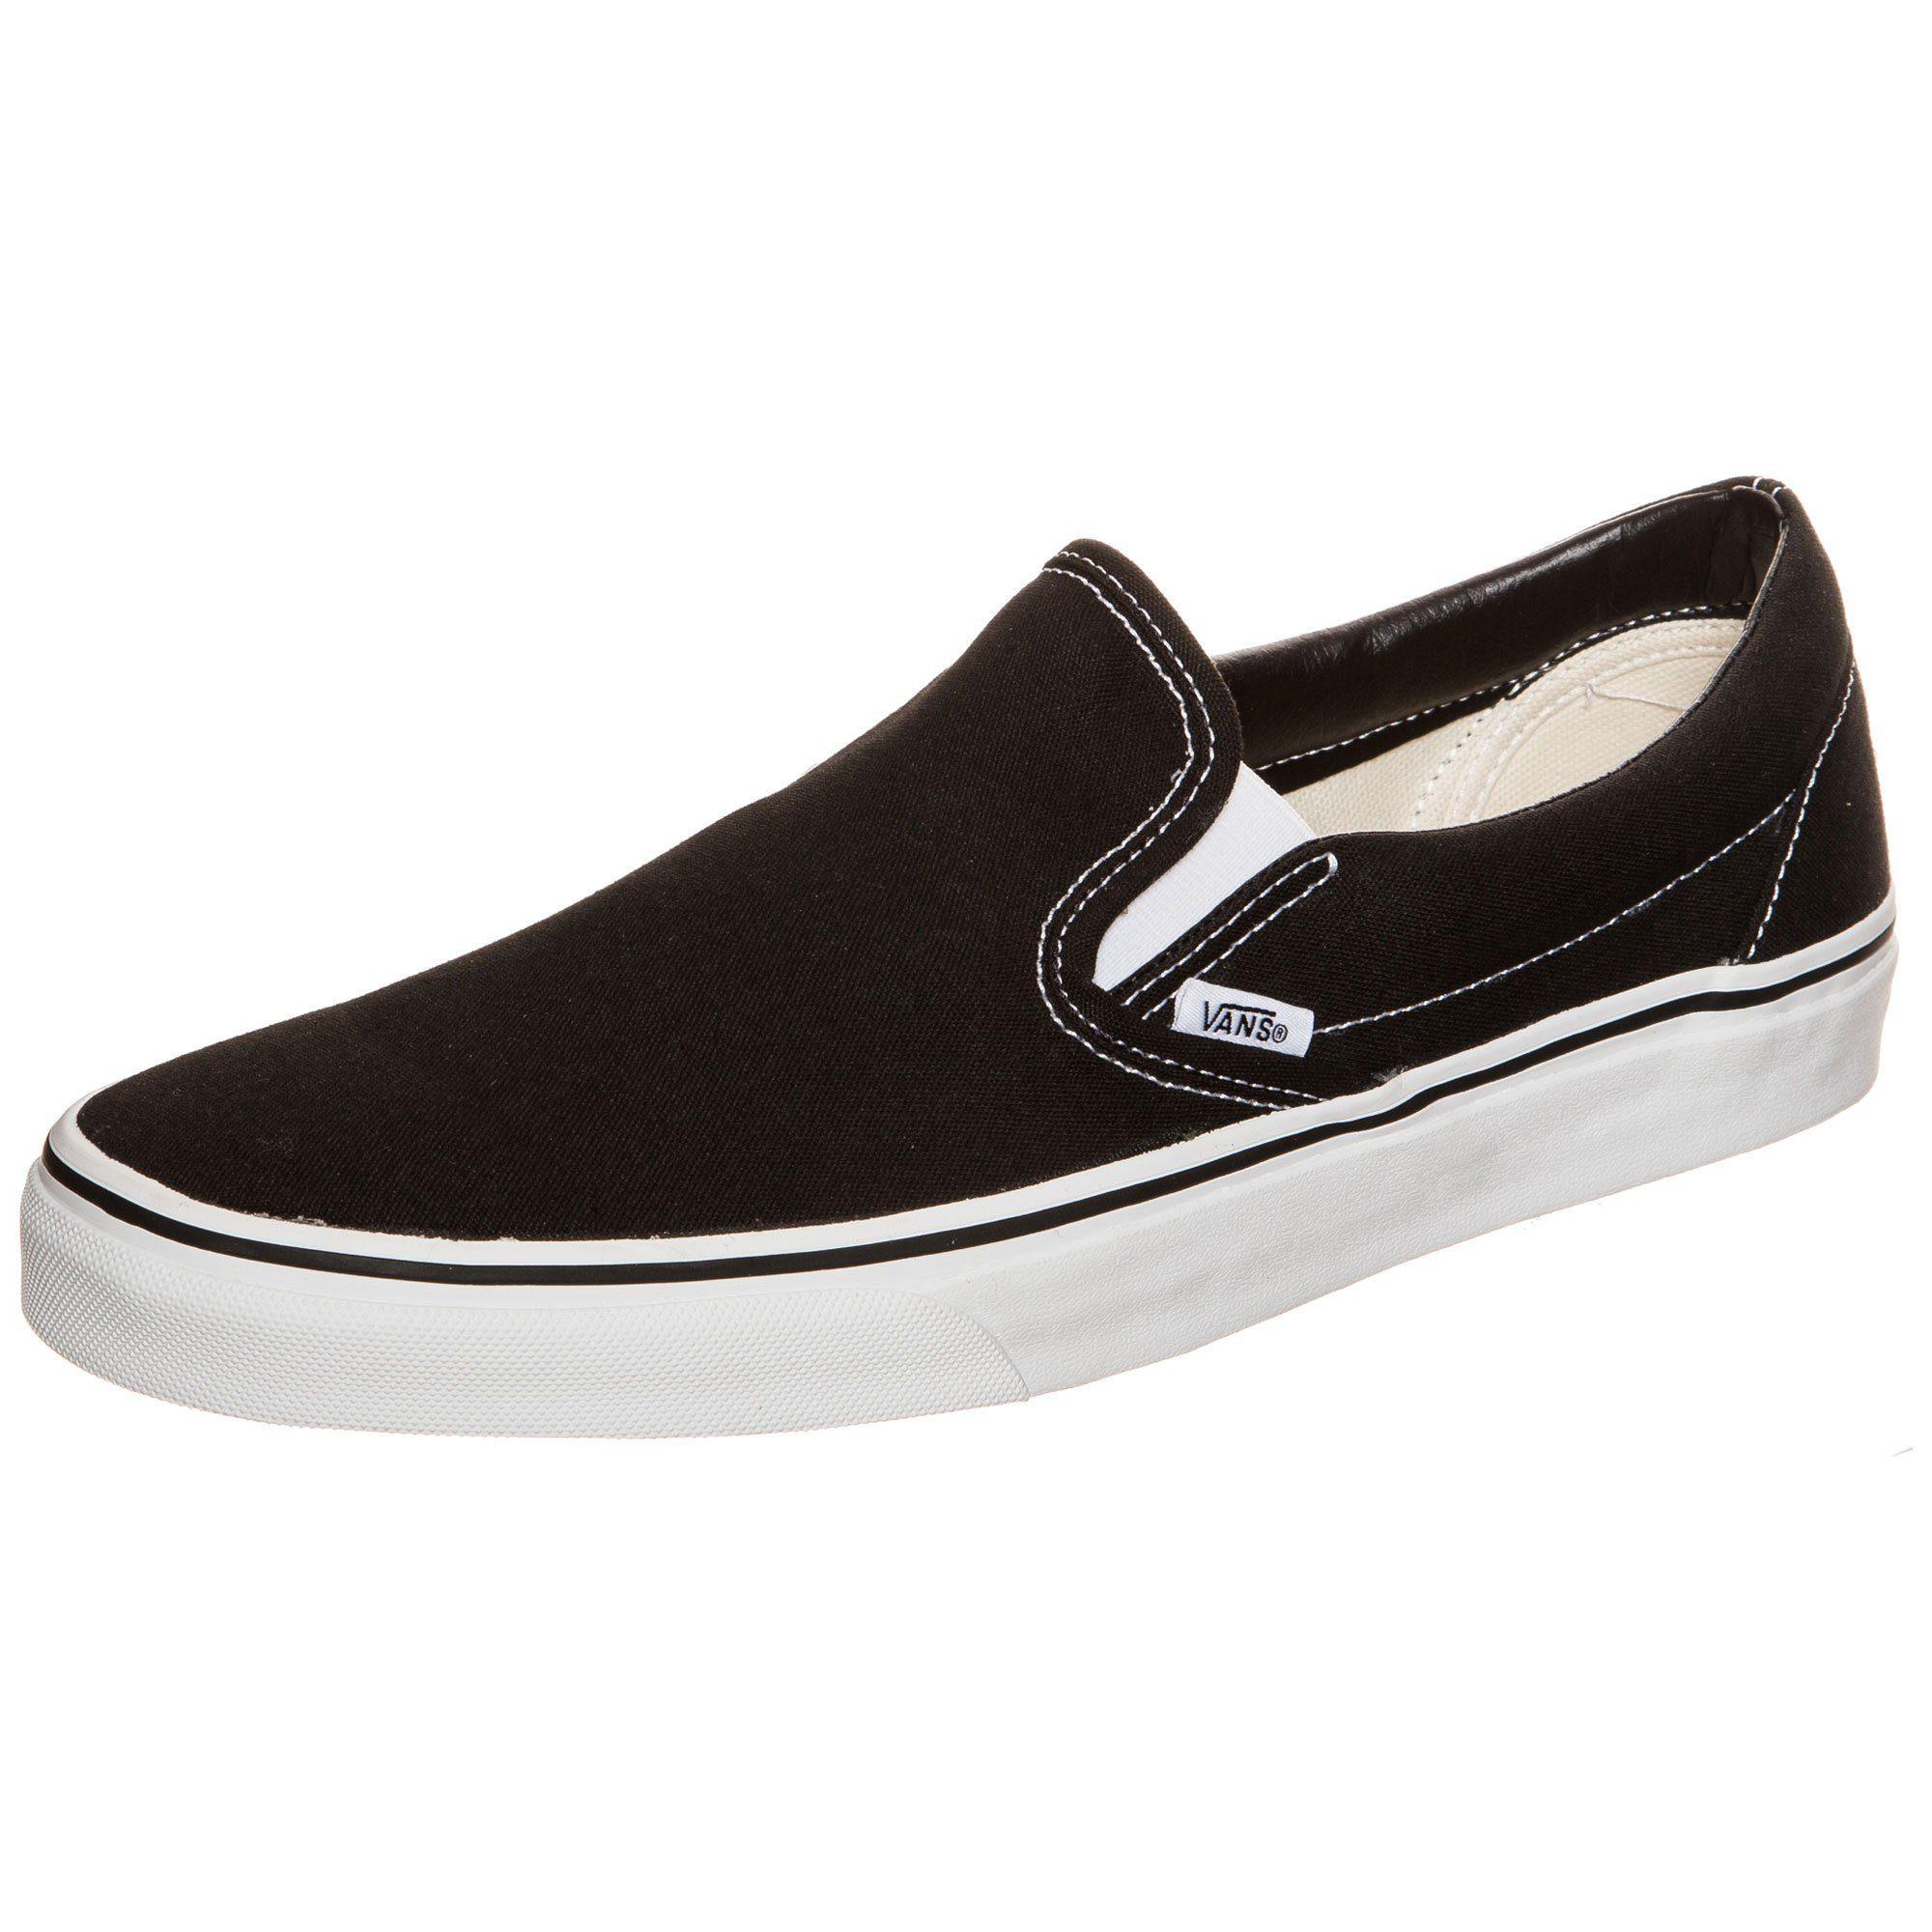 VANS Classic Slip-On Sneaker | Bekleidung > Wäsche > Slips & Strings | Schwarz | Vans